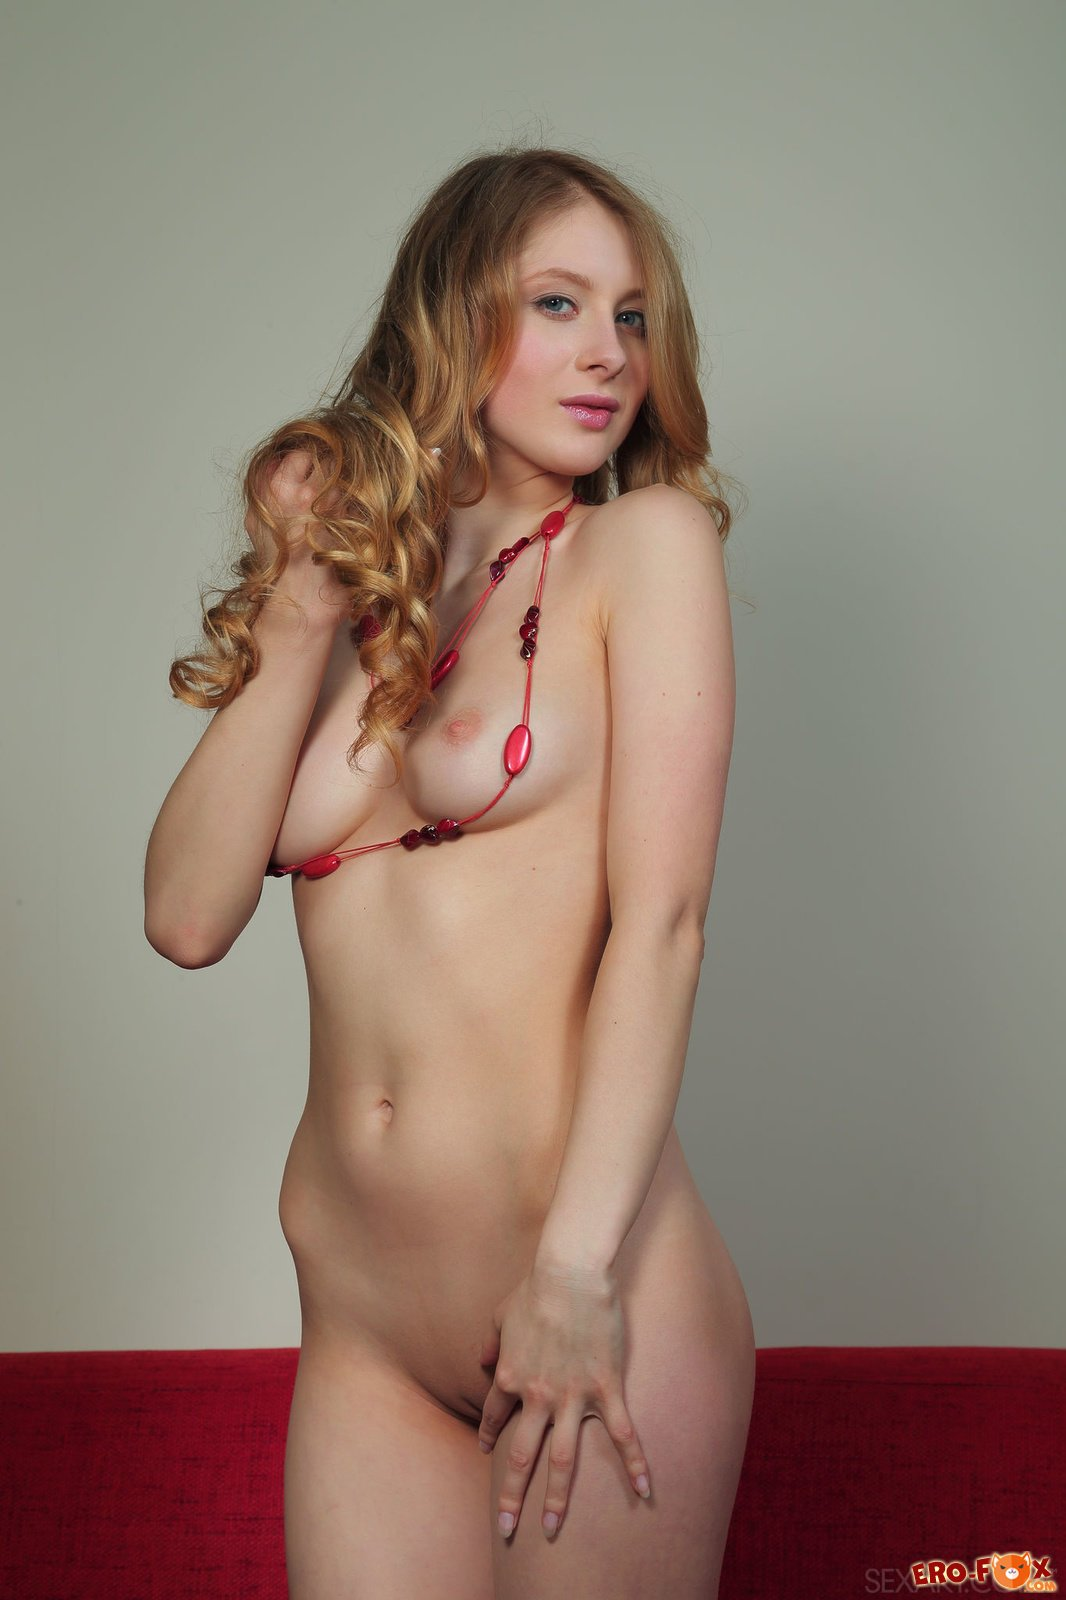 Сексуальная голая девушка раком на диване